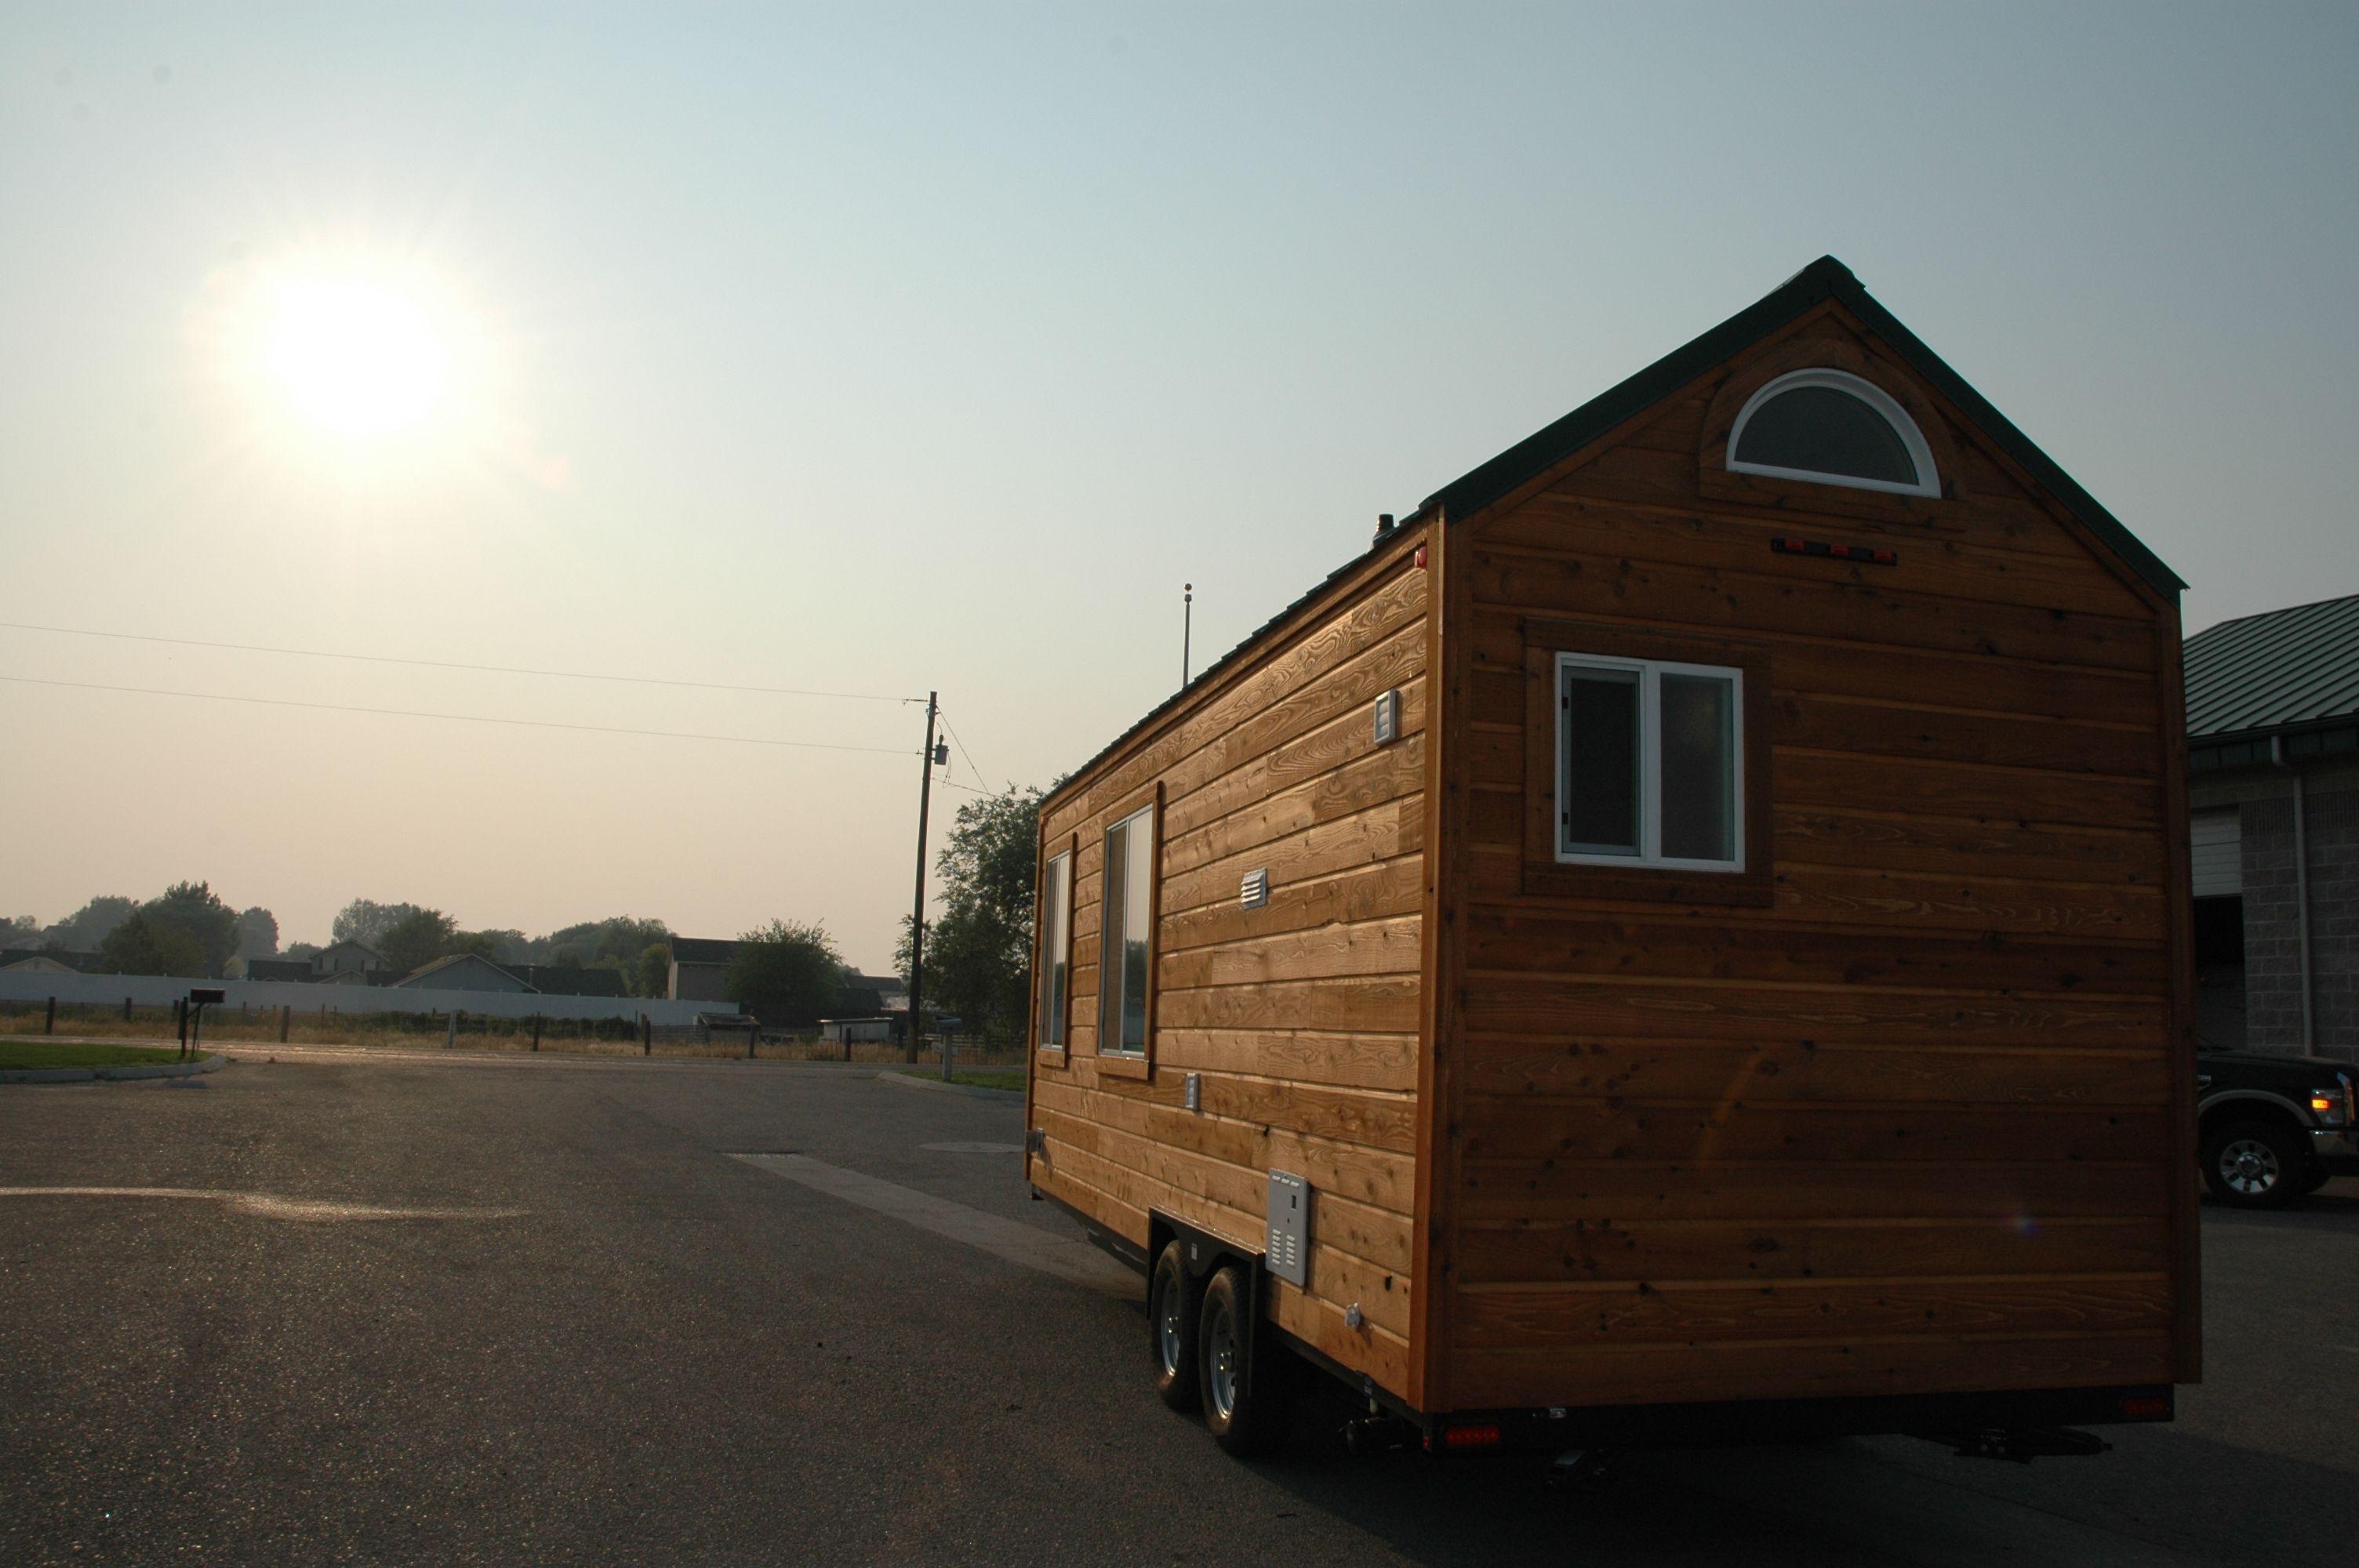 Beautiful Exterior Of Tiny Home On Wheel, Cedar Lap Siding